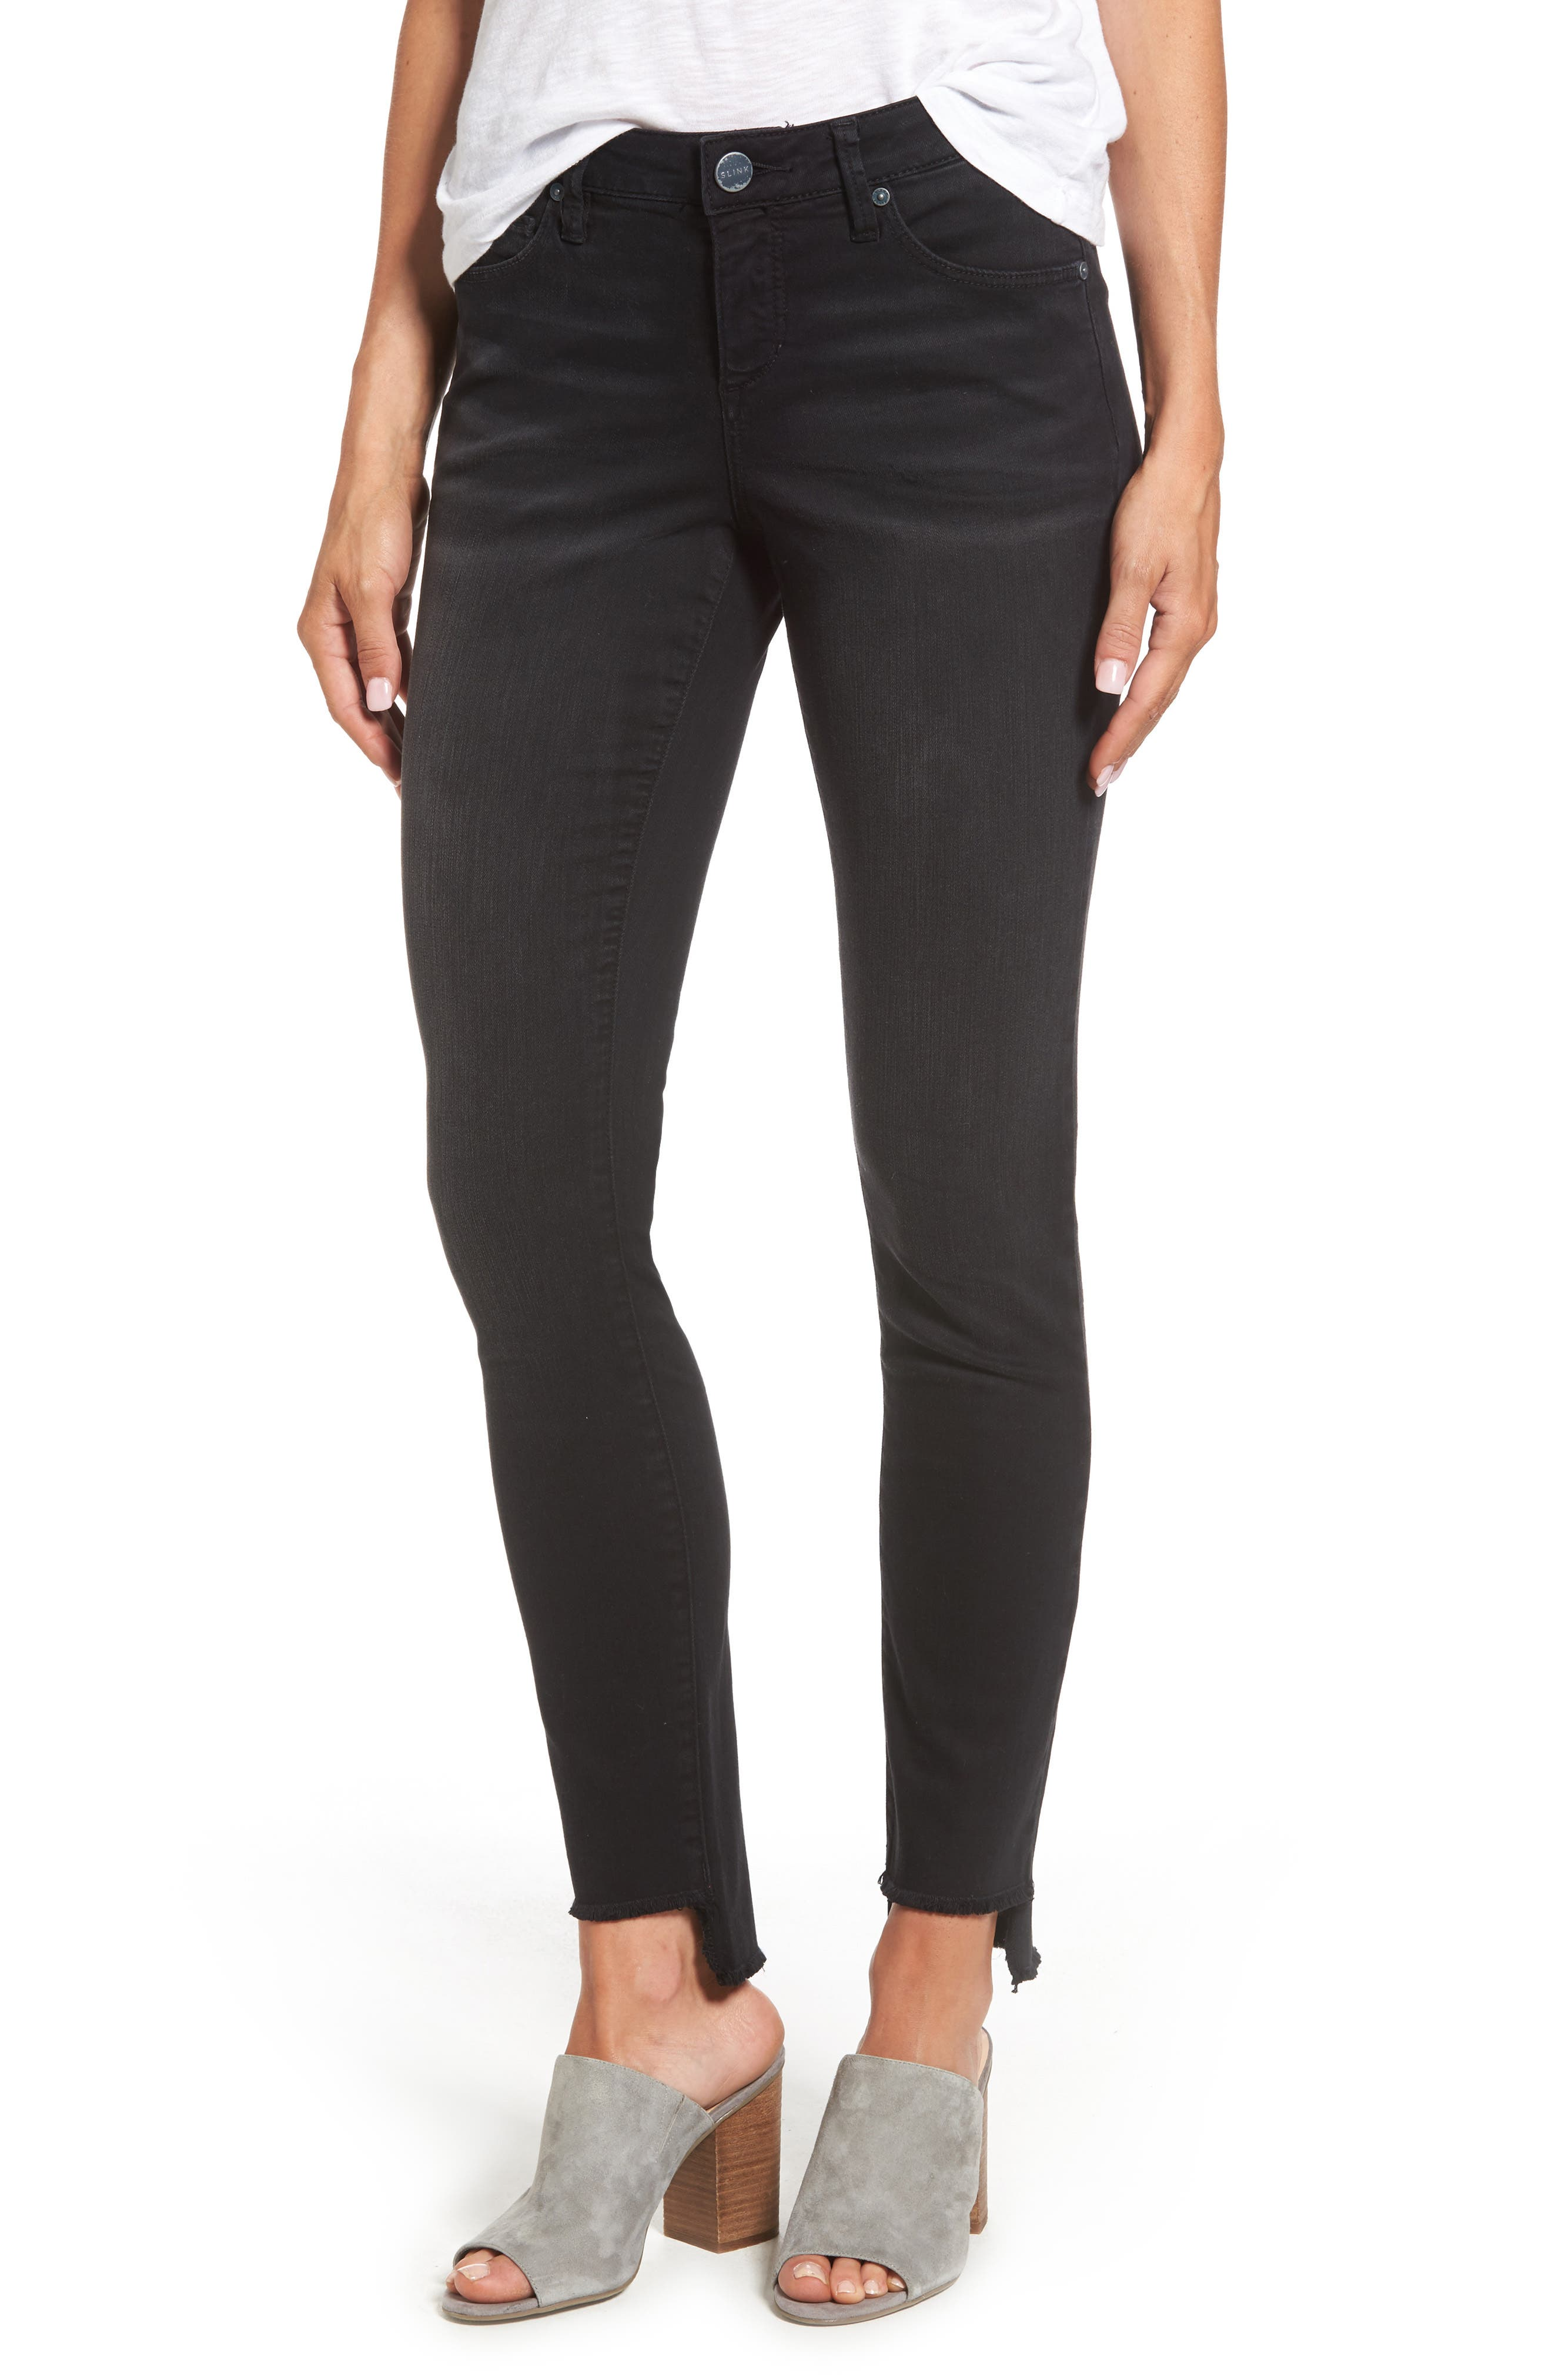 Main Image - SLINK Jeans Step Hem Skinny Jeans (Mimi)